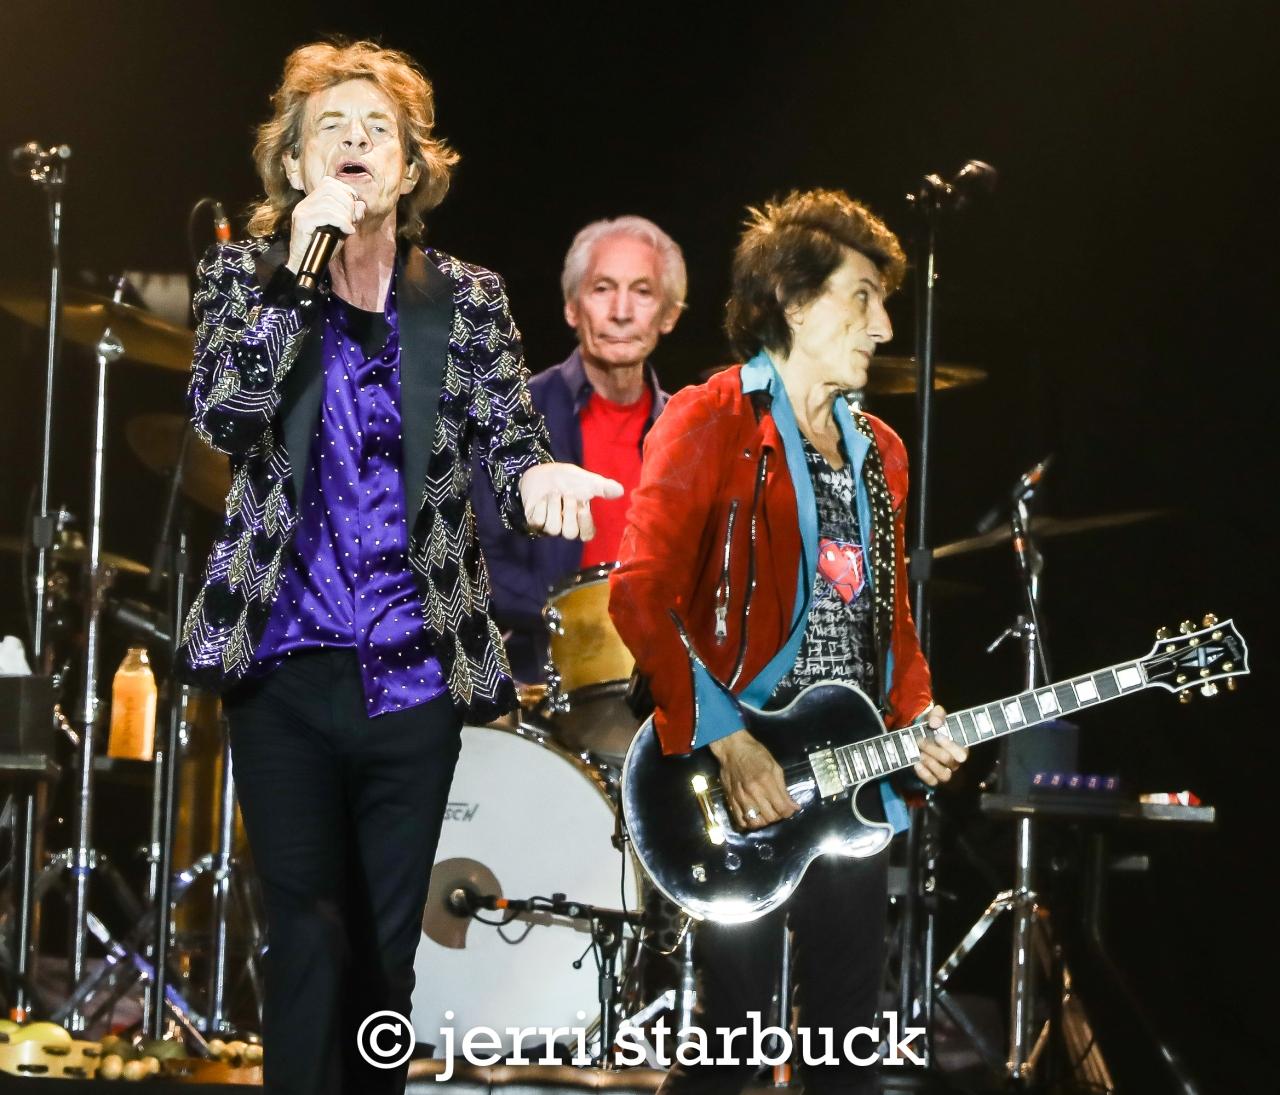 Photos: Rock Legend's The Rolling Stones Gave Houston An UnforgettableConcert